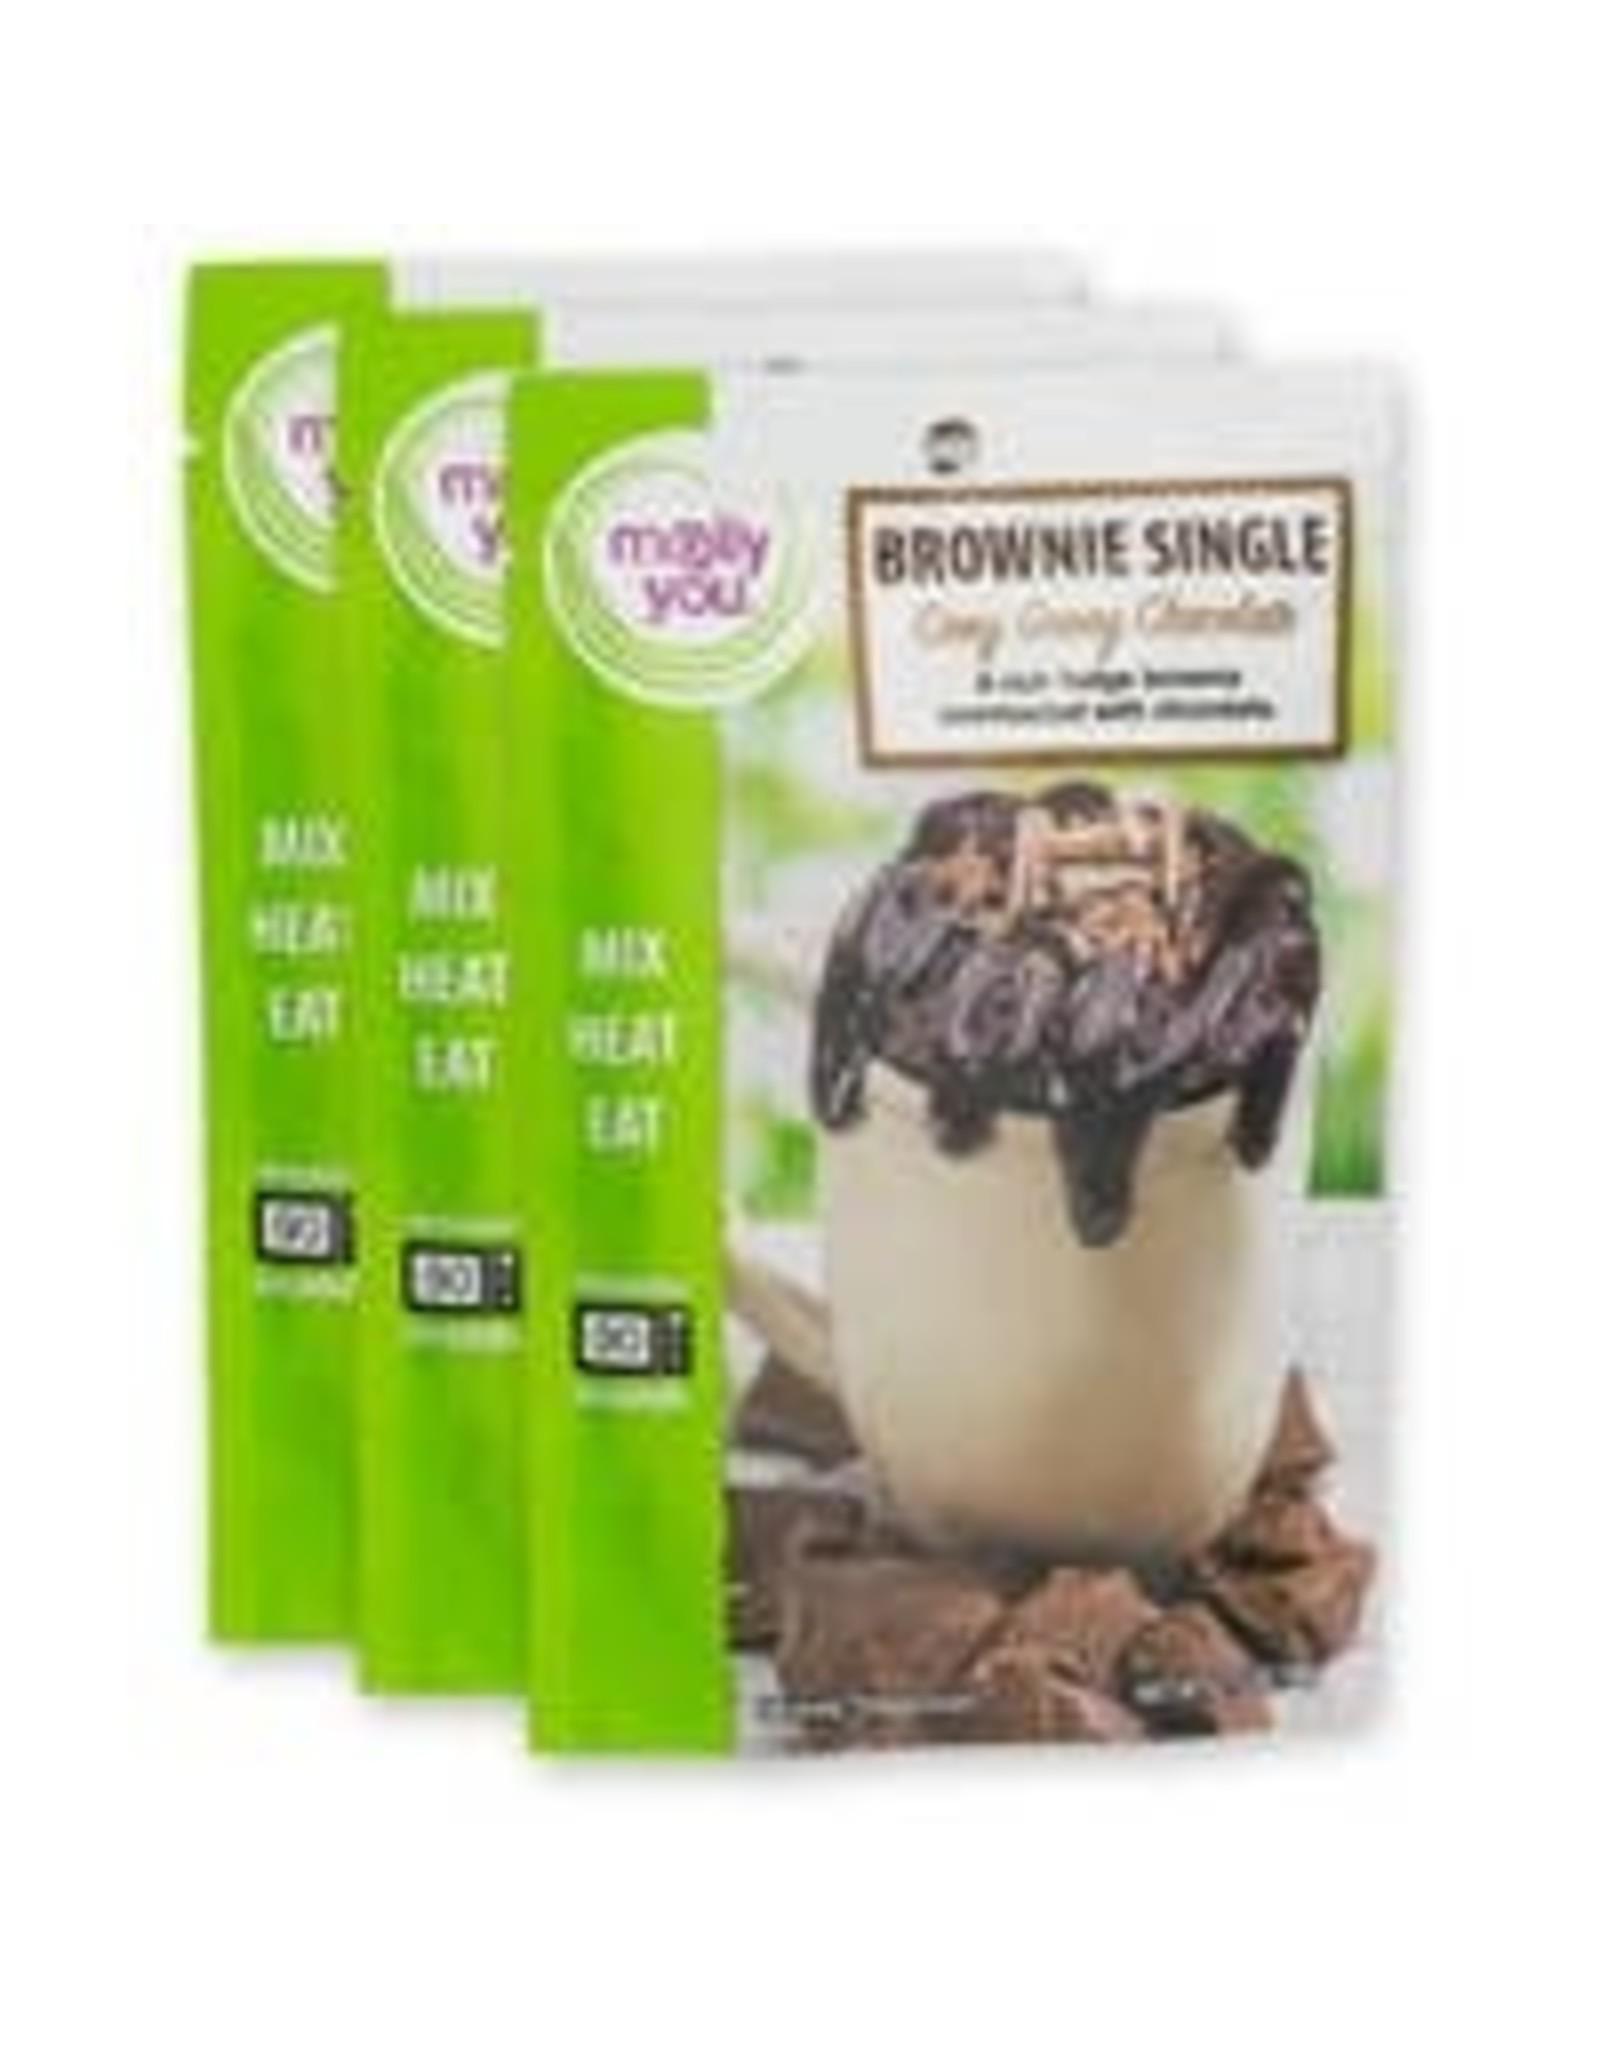 Ooey Gooey Chocolate Brownie Single